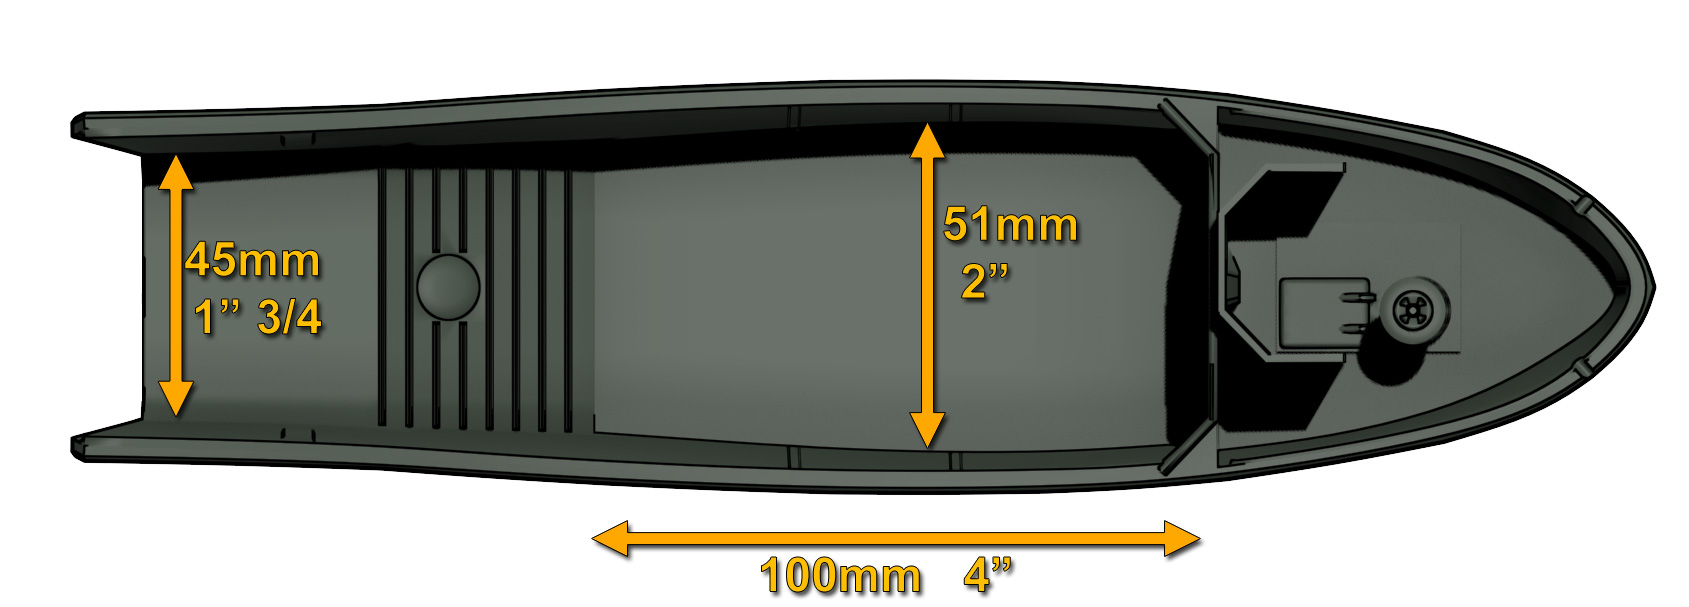 Deck sizes